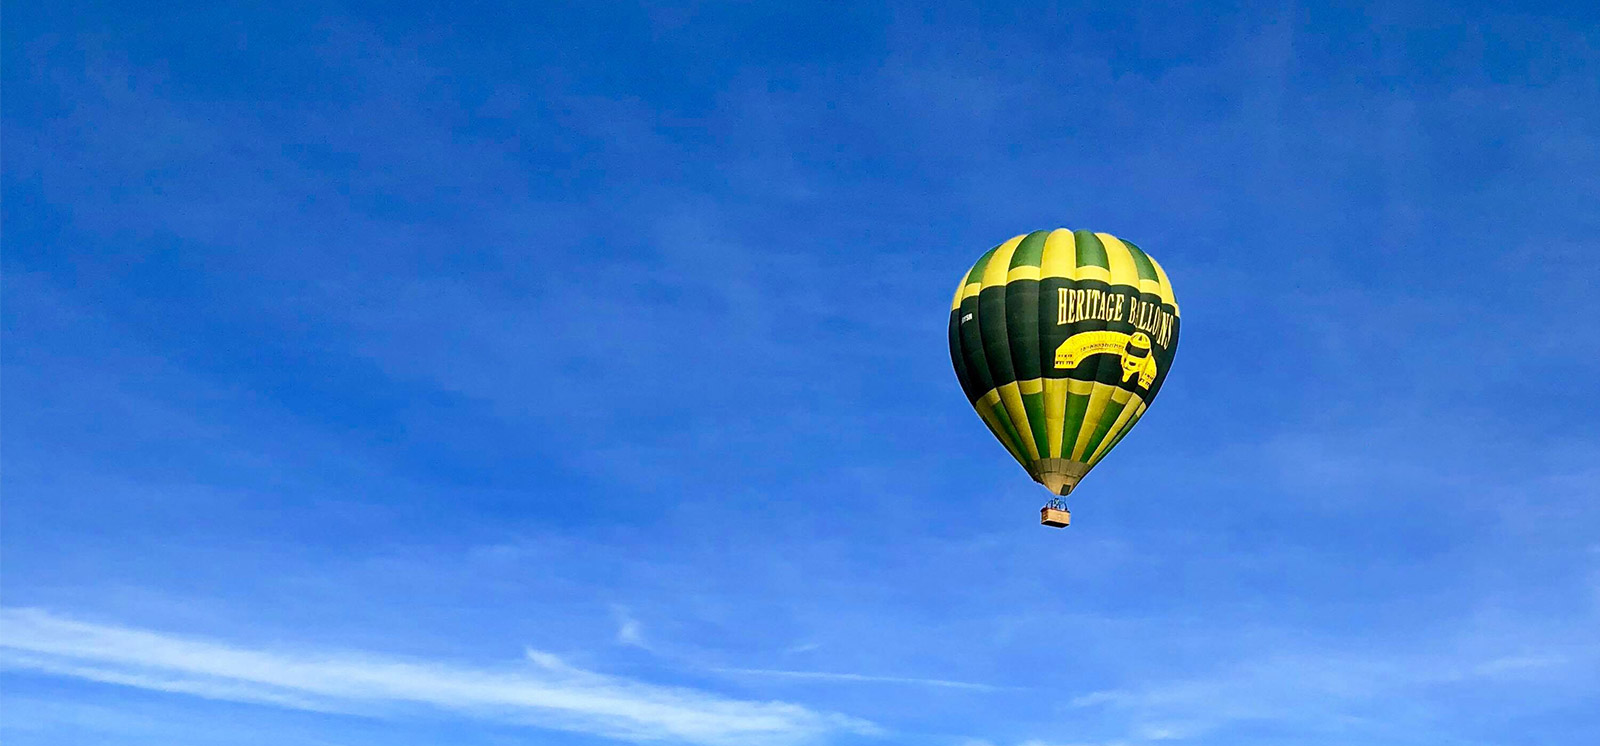 Yorkshire Balloon Flights hot air balloon over York